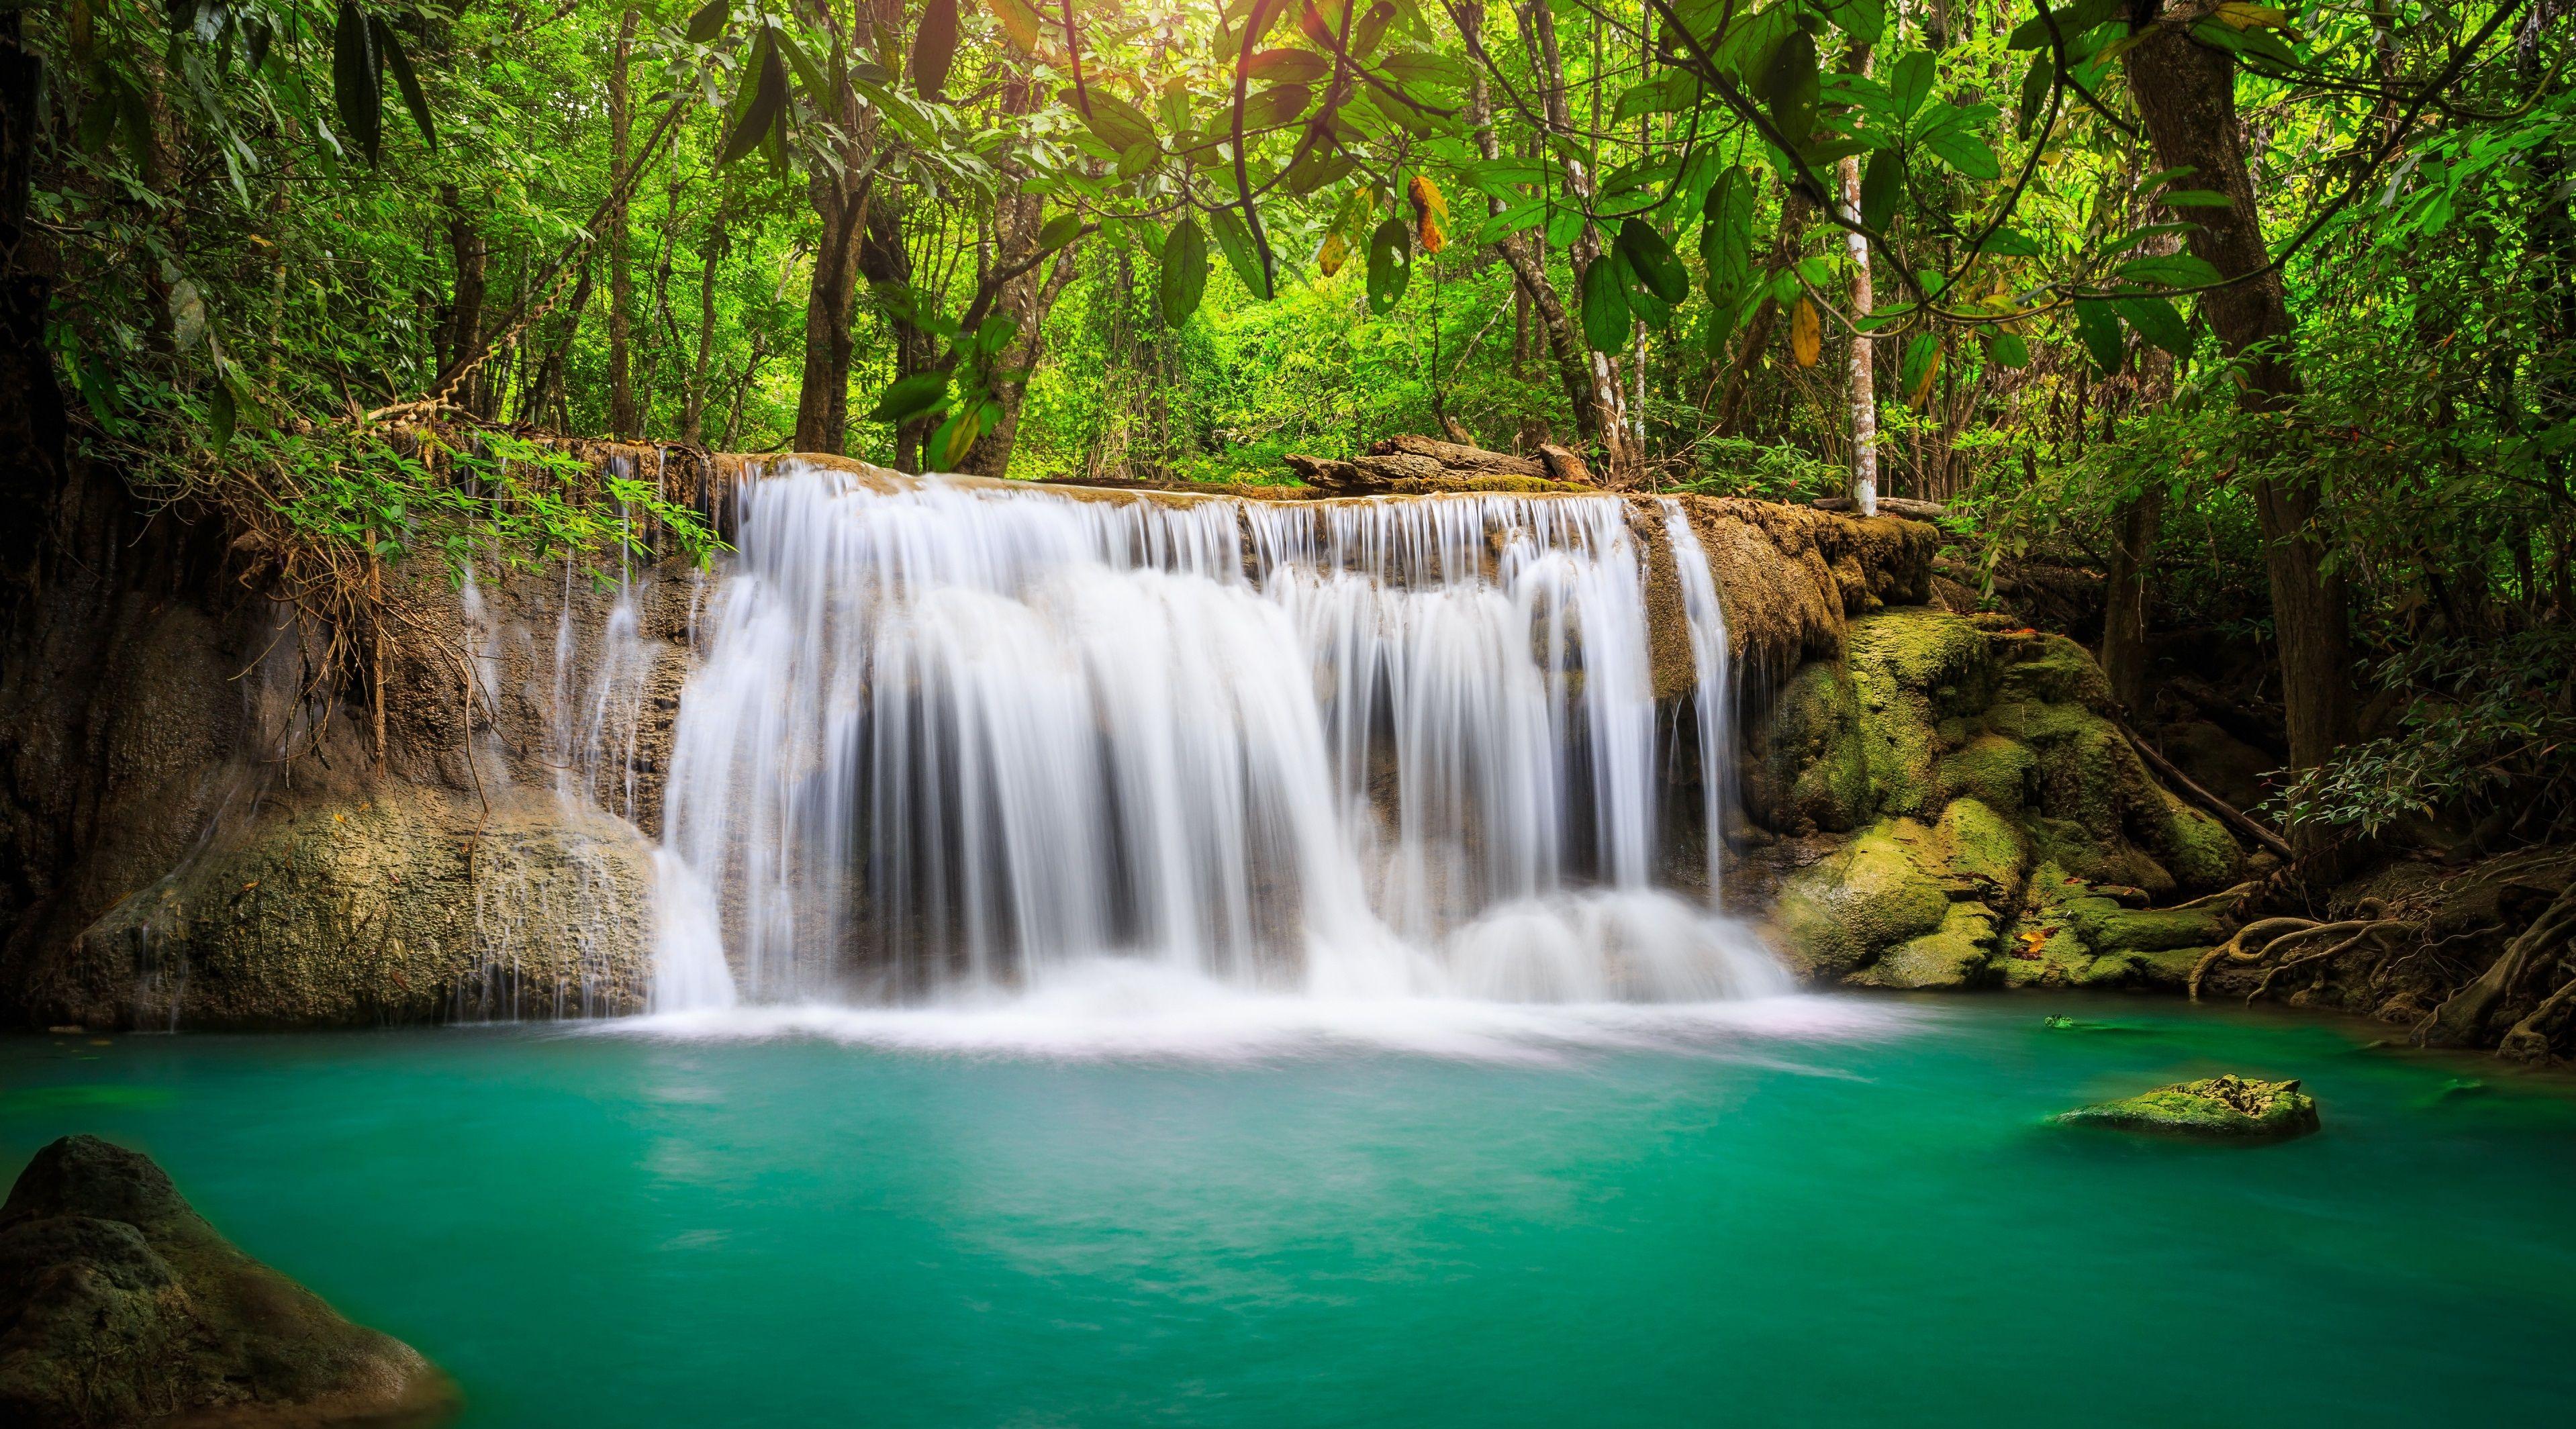 Amazing Hd Rainforest Waterfall Wallpaper Waterfall Wallpaper